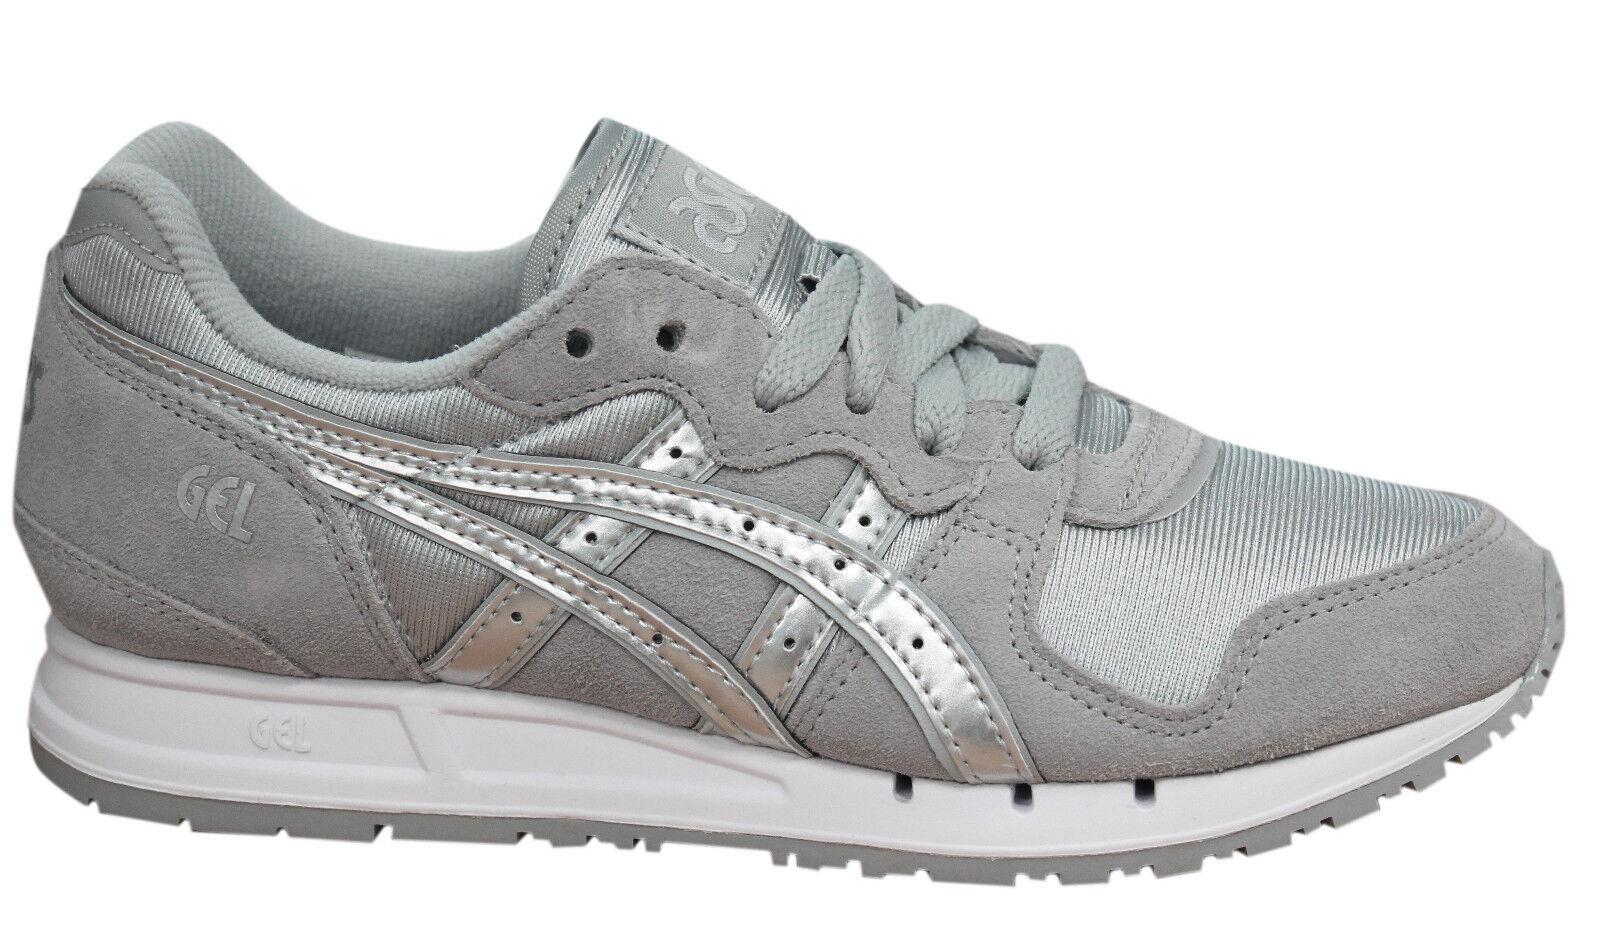 ASICS gel-movimentum con lacci grigio argentooo tessuto da Donna Scarpe ginnastica